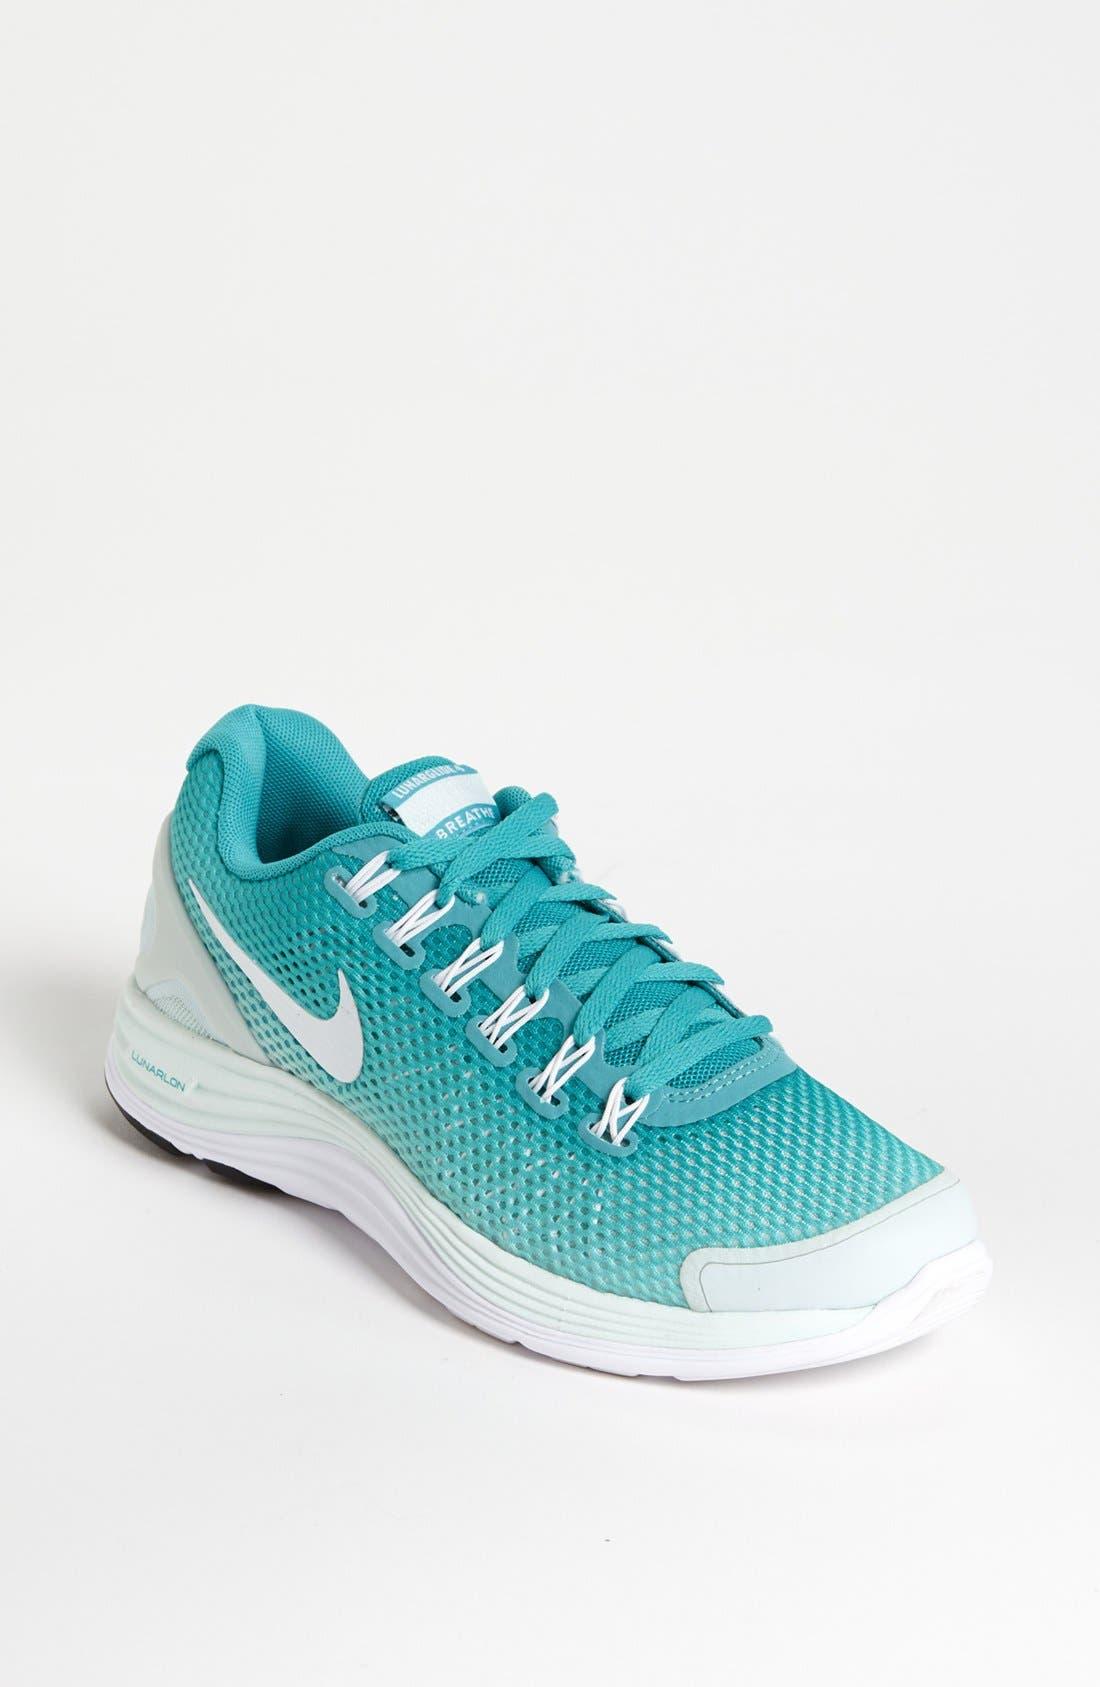 Alternate Image 1 Selected - Nike 'LunarGlide 4 Breathe' Running Shoe (Women)